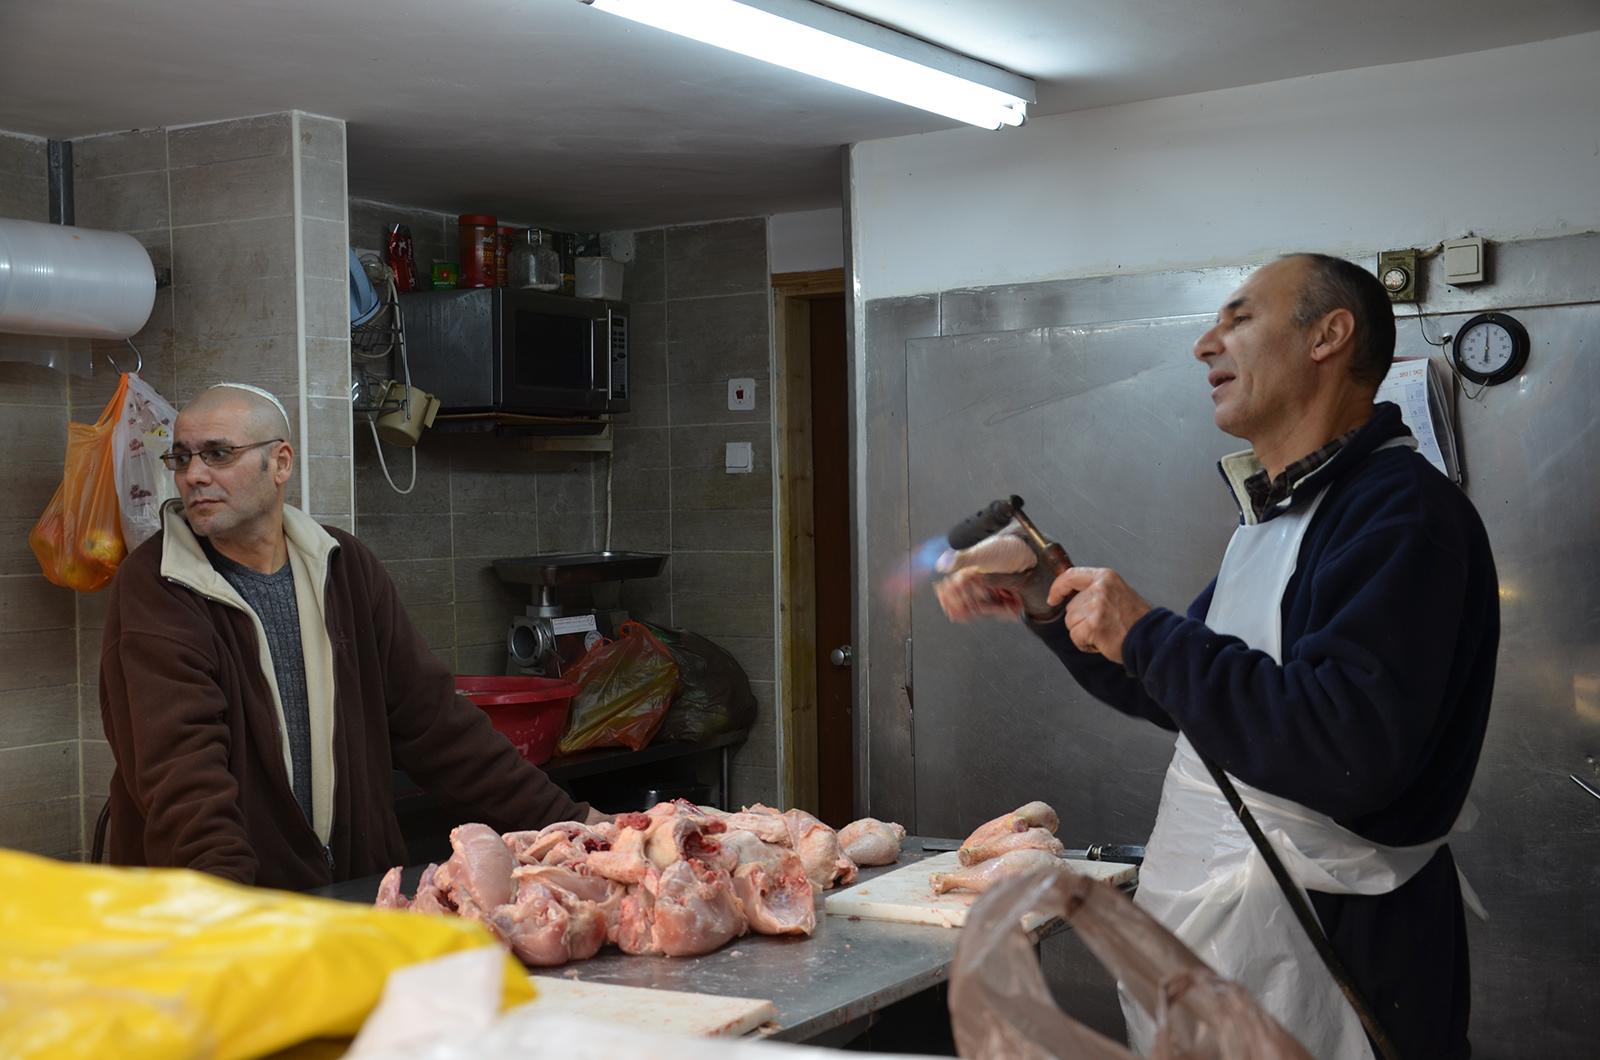 prodavač drůbežiho na Karmelském trhu, Tel-Aviv, Izrael